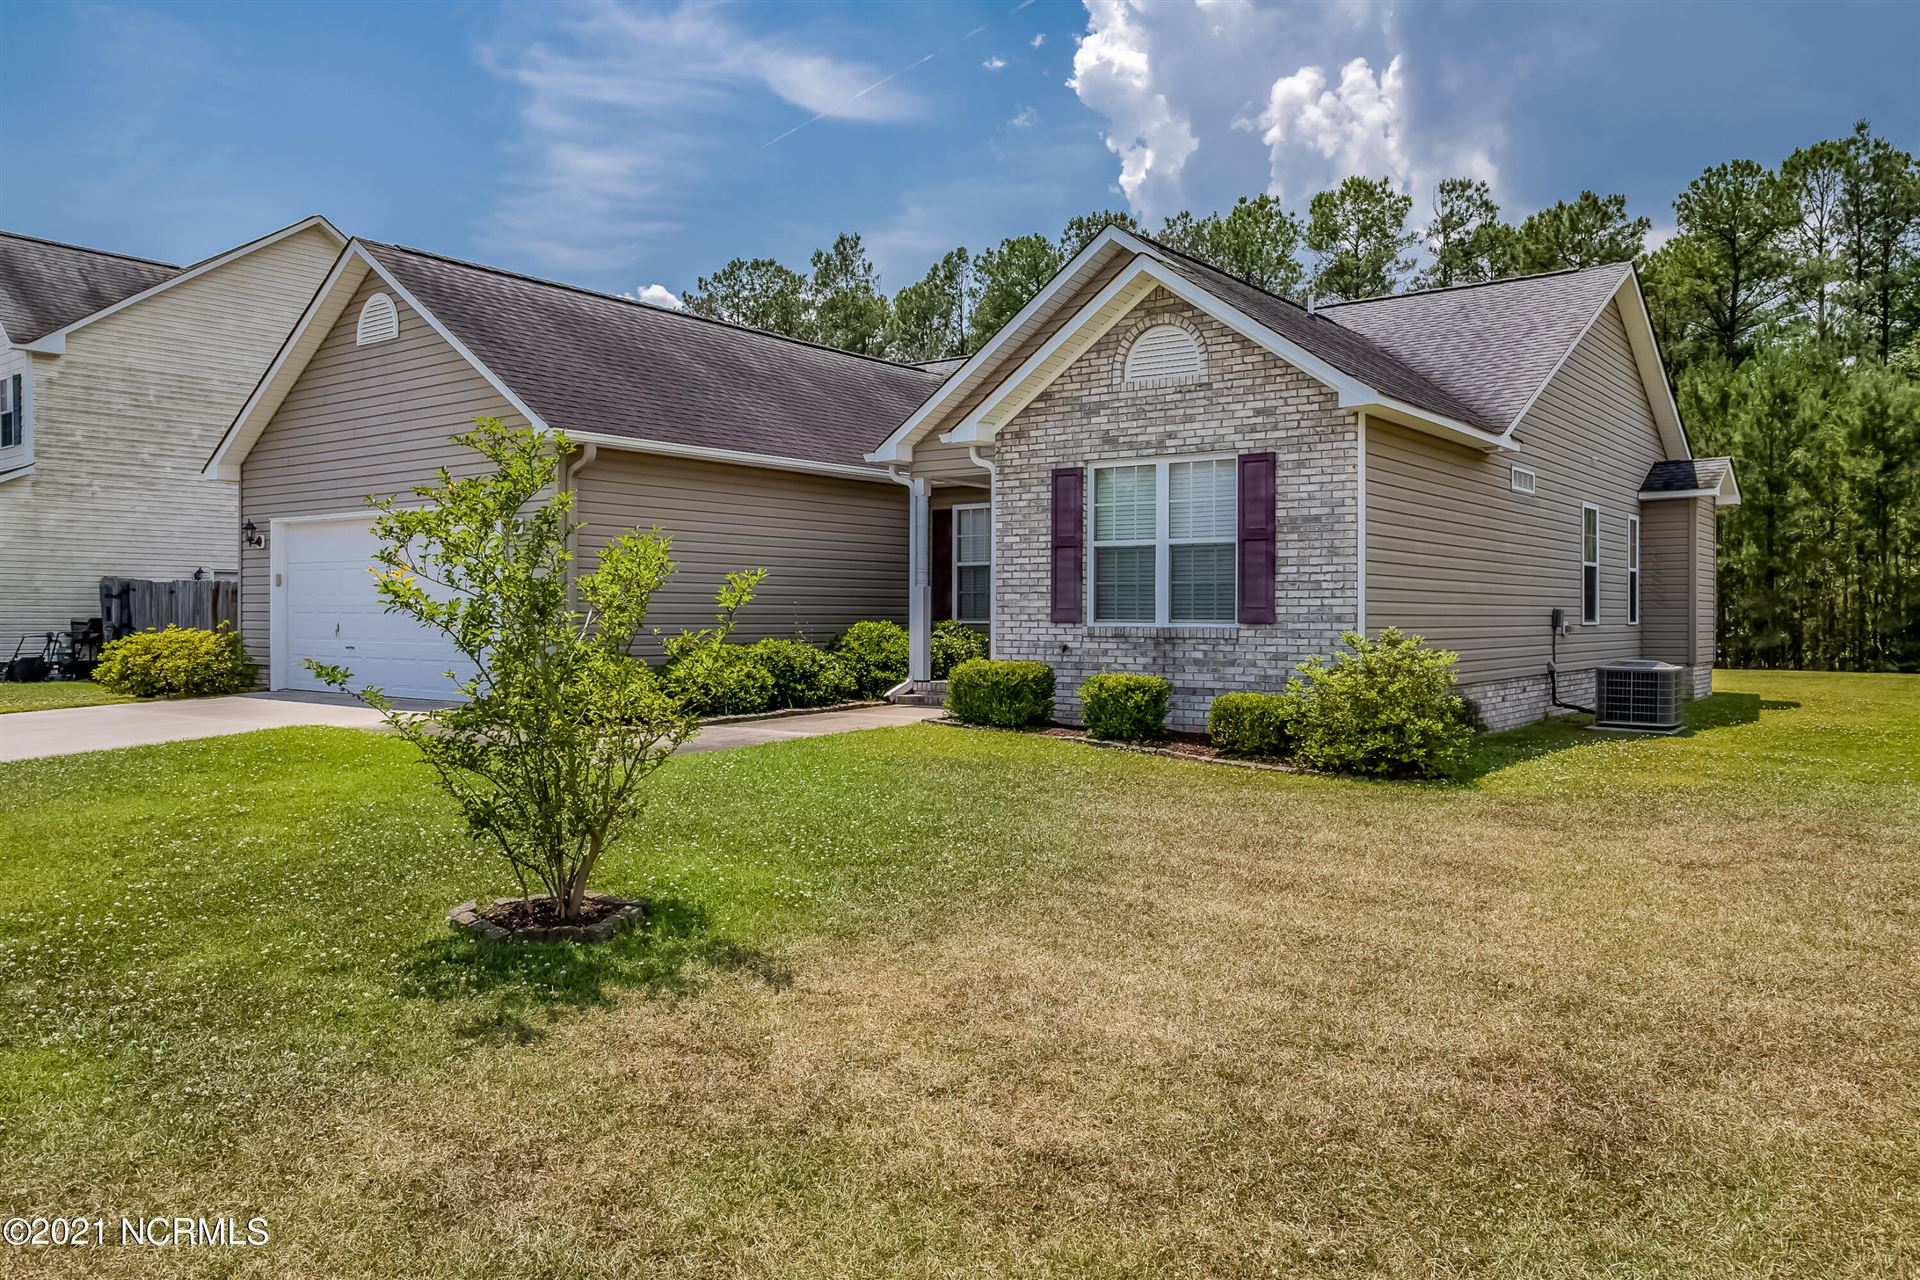 Photo of 305 Savannah Drive, Jacksonville, NC 28546 (MLS # 100273730)